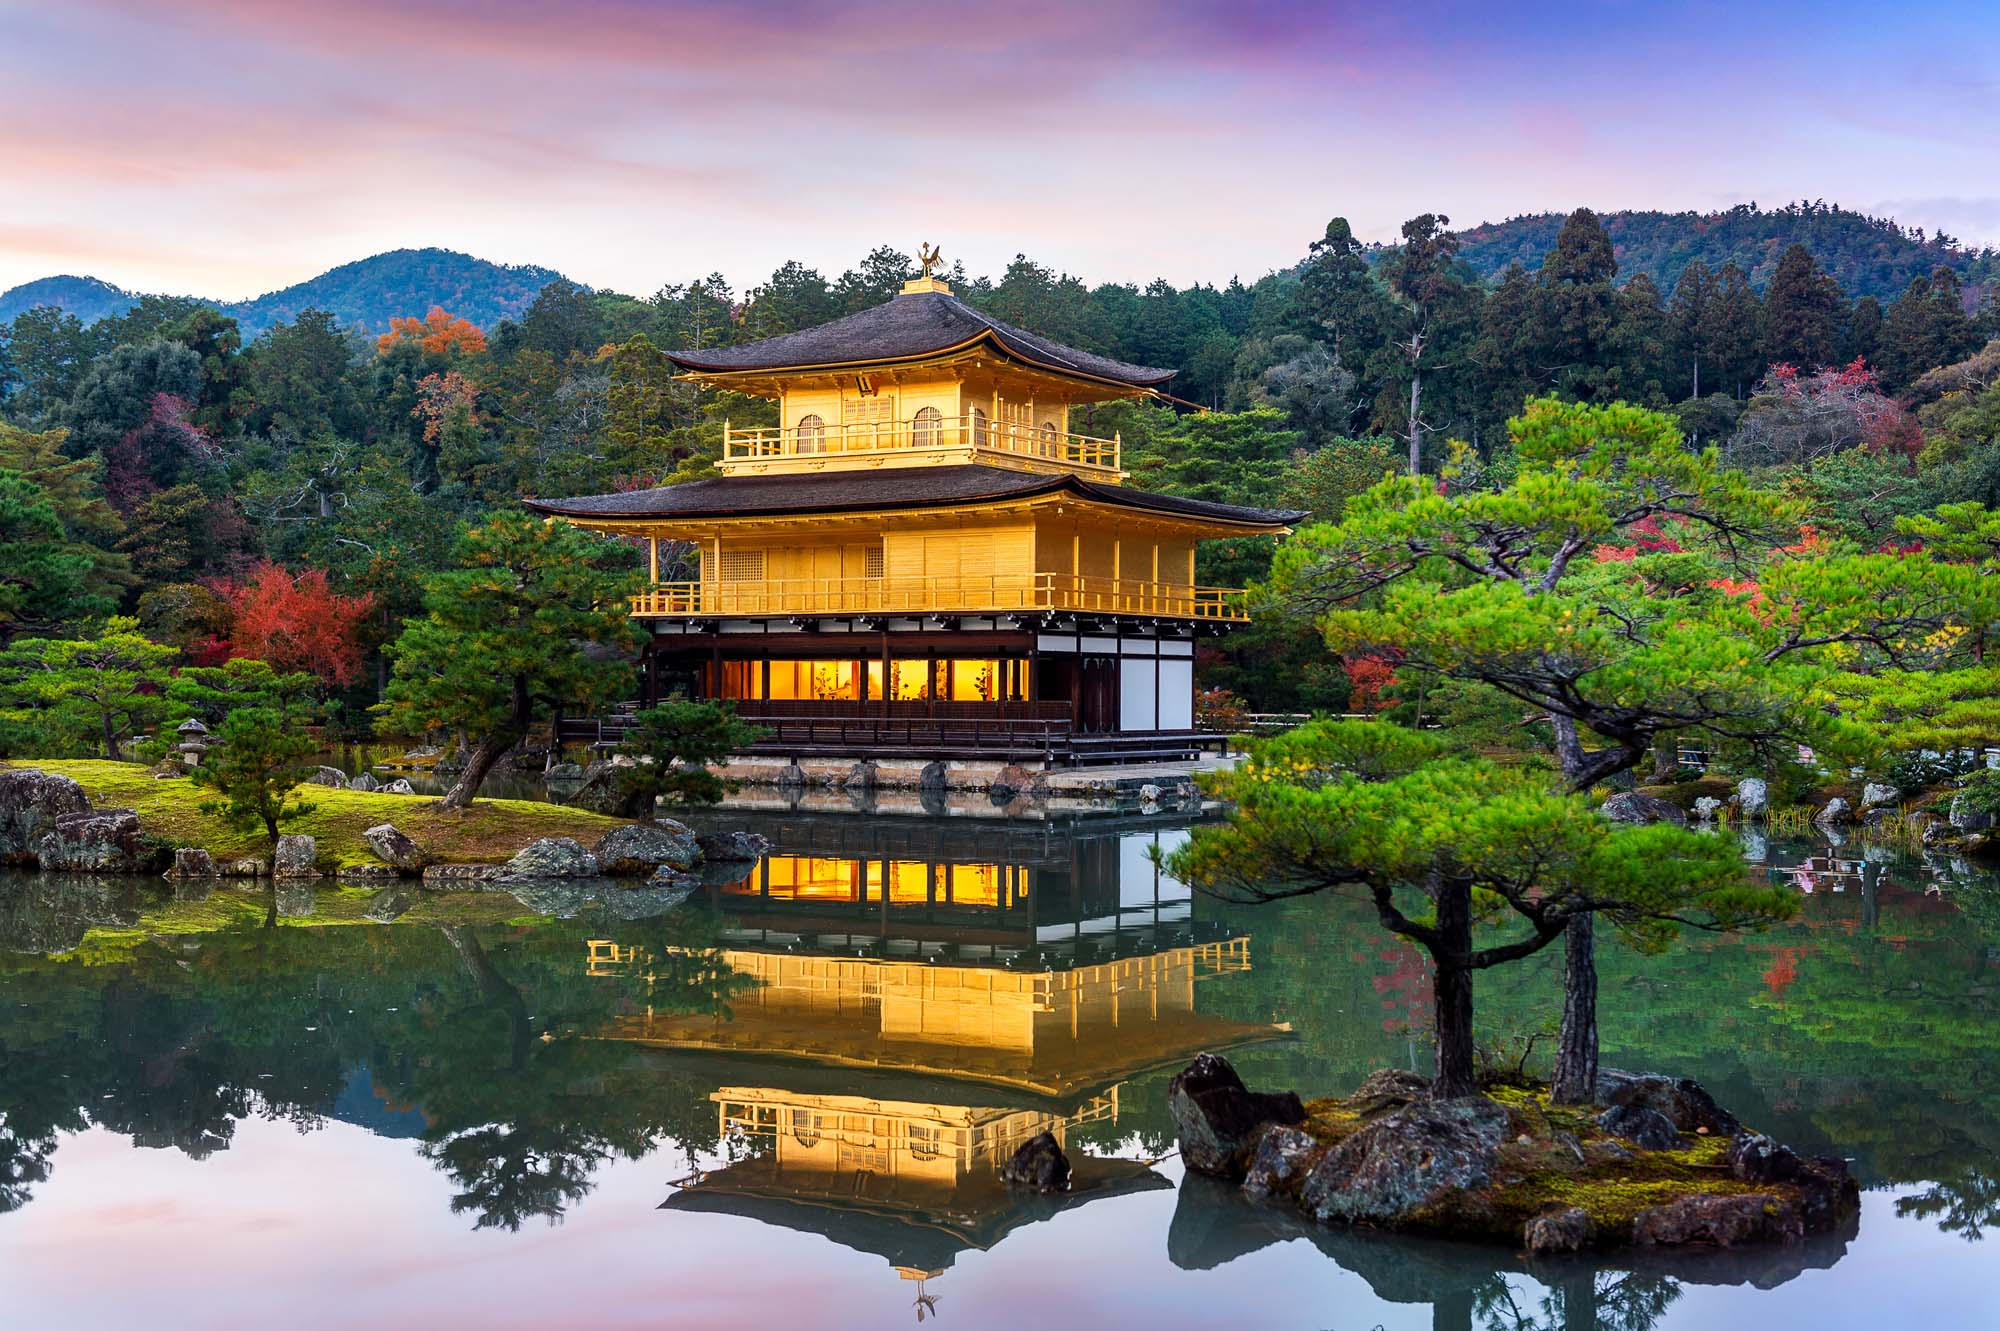 Kyoto, Japan eid summer travel destination ideas